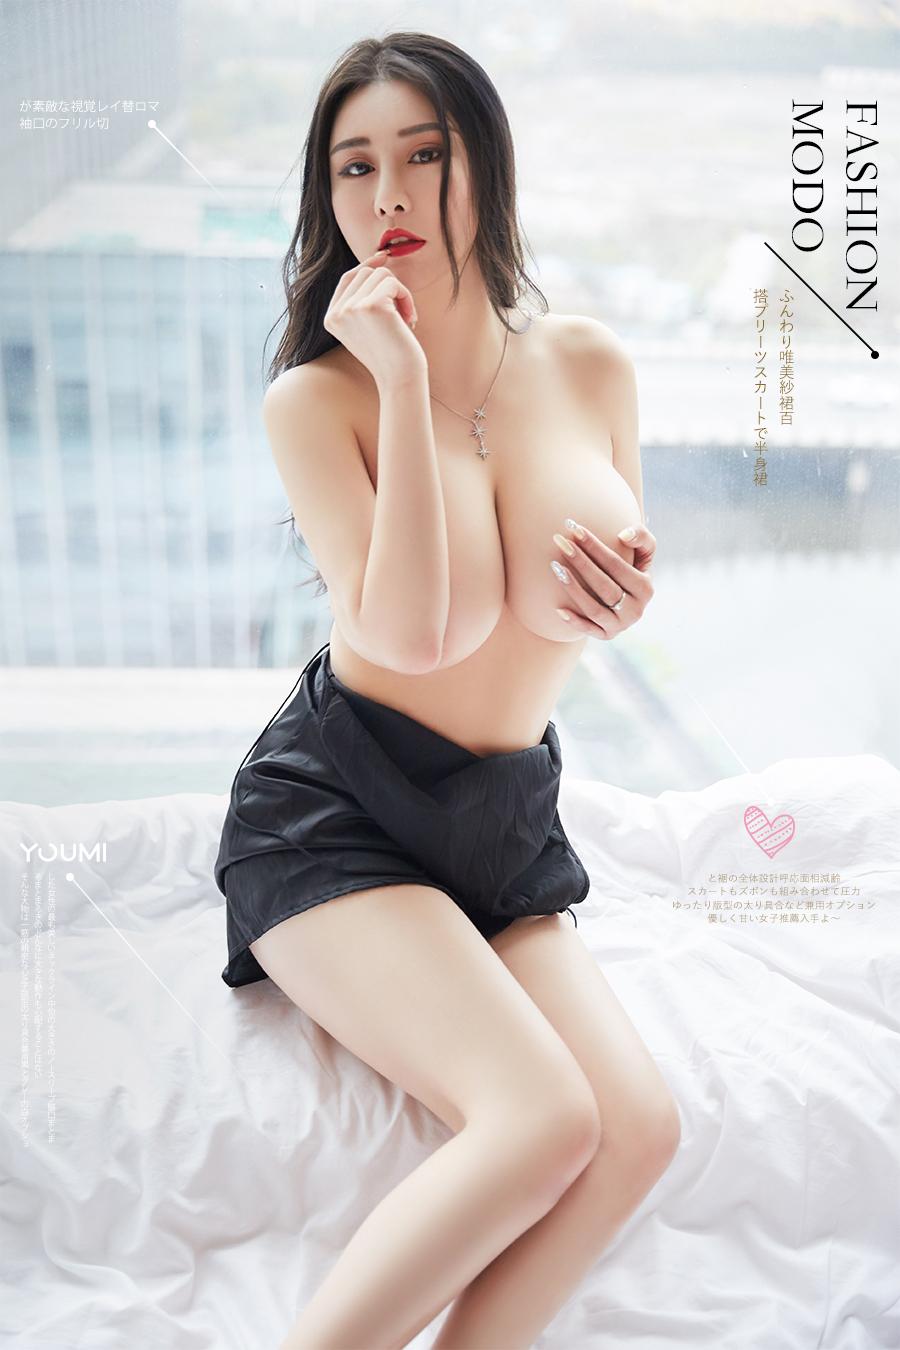 [YouMi尤蜜]2019.09.25 豪乳女皇 费若拉[/18MB]